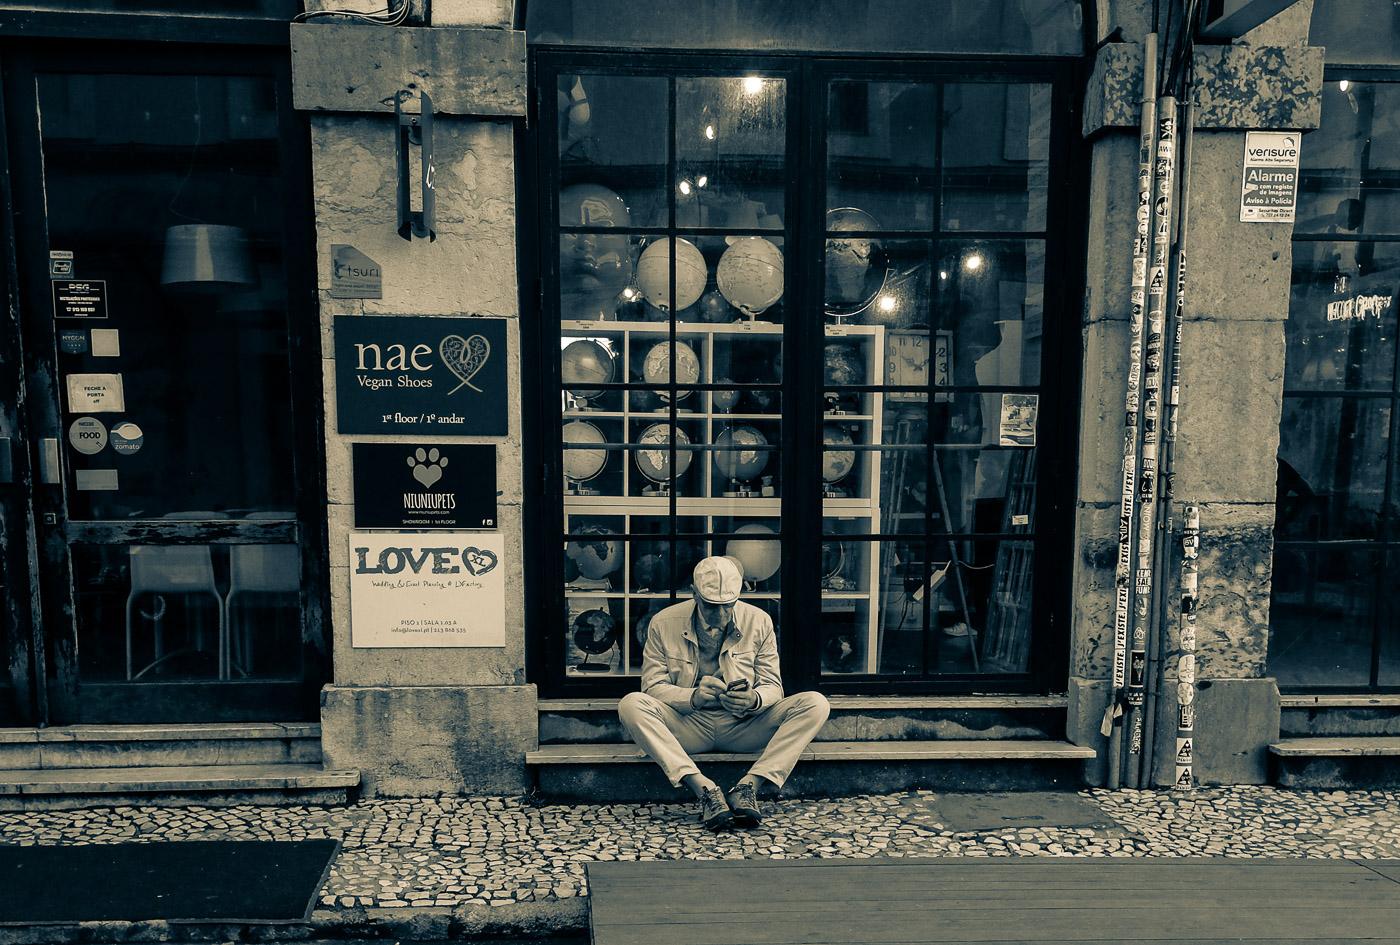 hb images - Lisboa - last day - 12